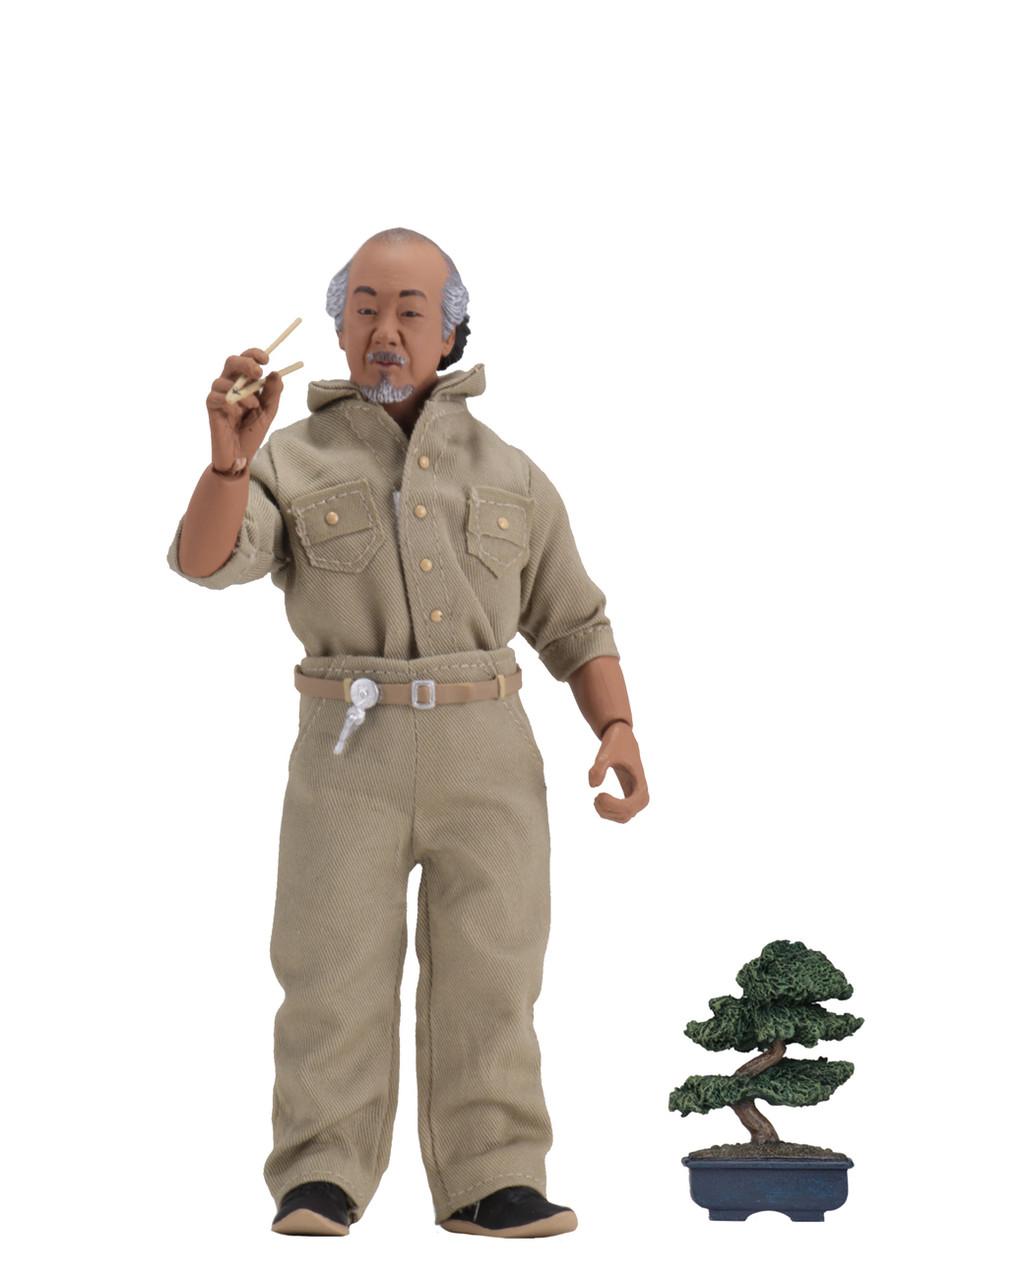 Karate Kid 1984 Daniel Larusso Clothed Action Figure